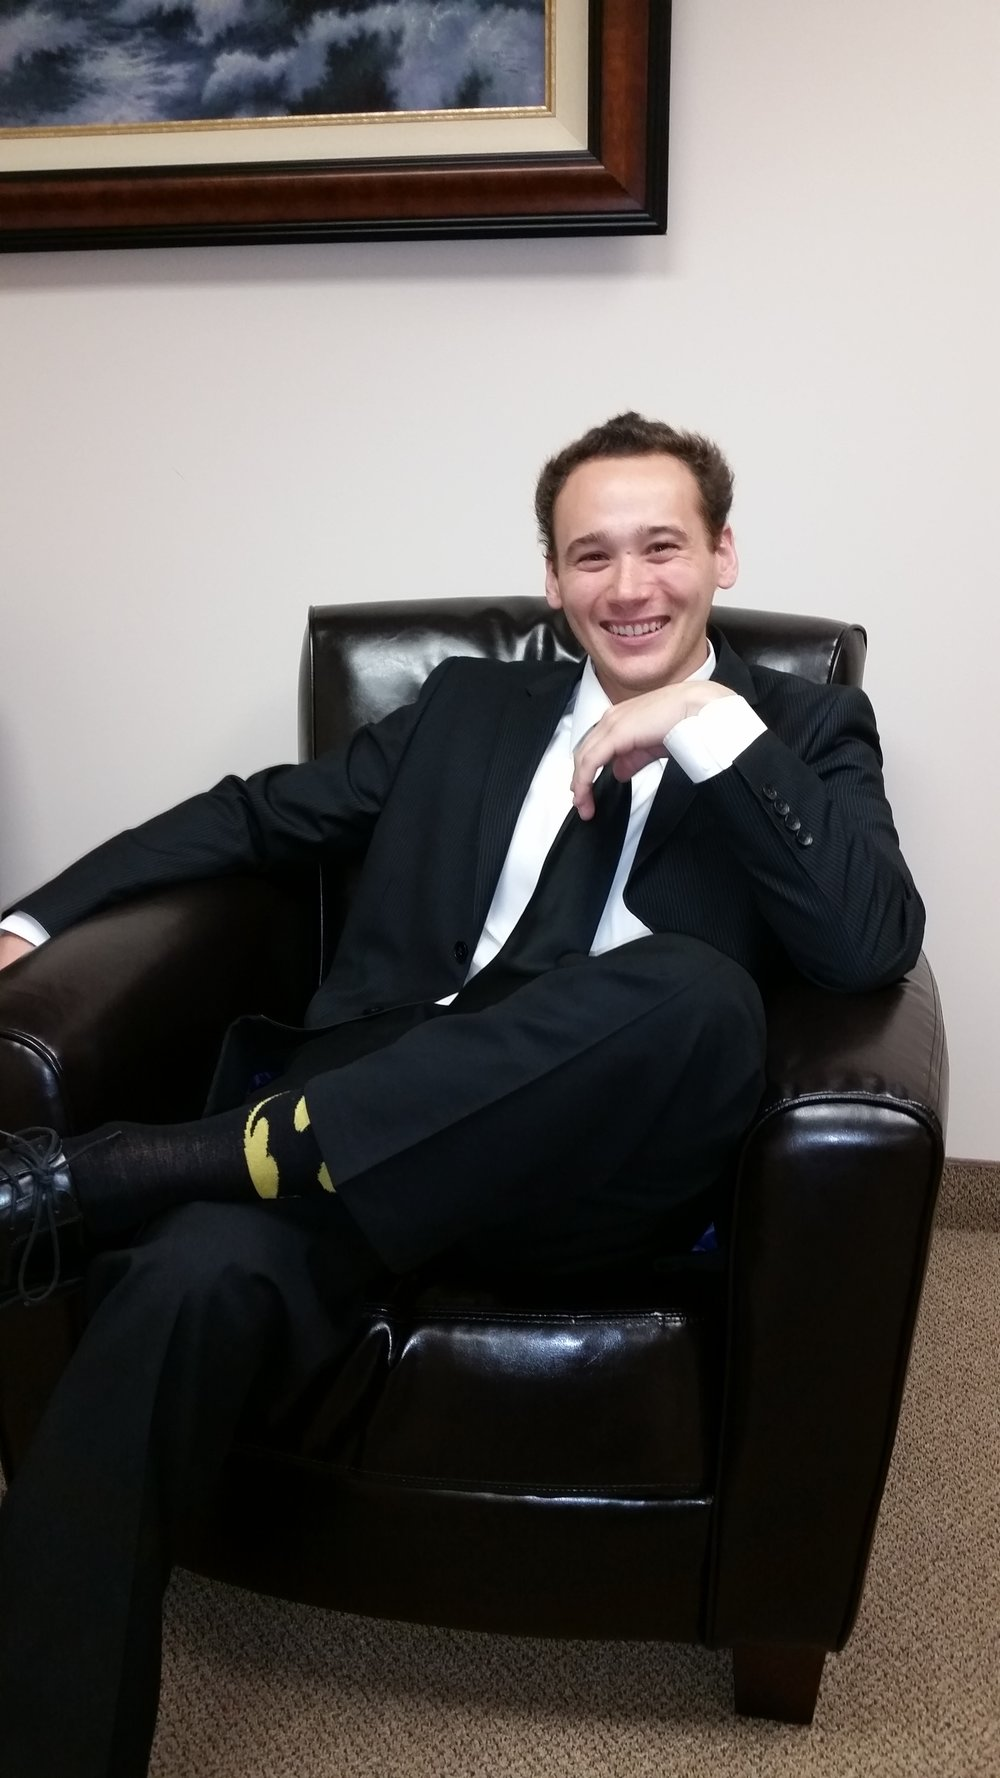 Managing Partner - Des Moines, IA